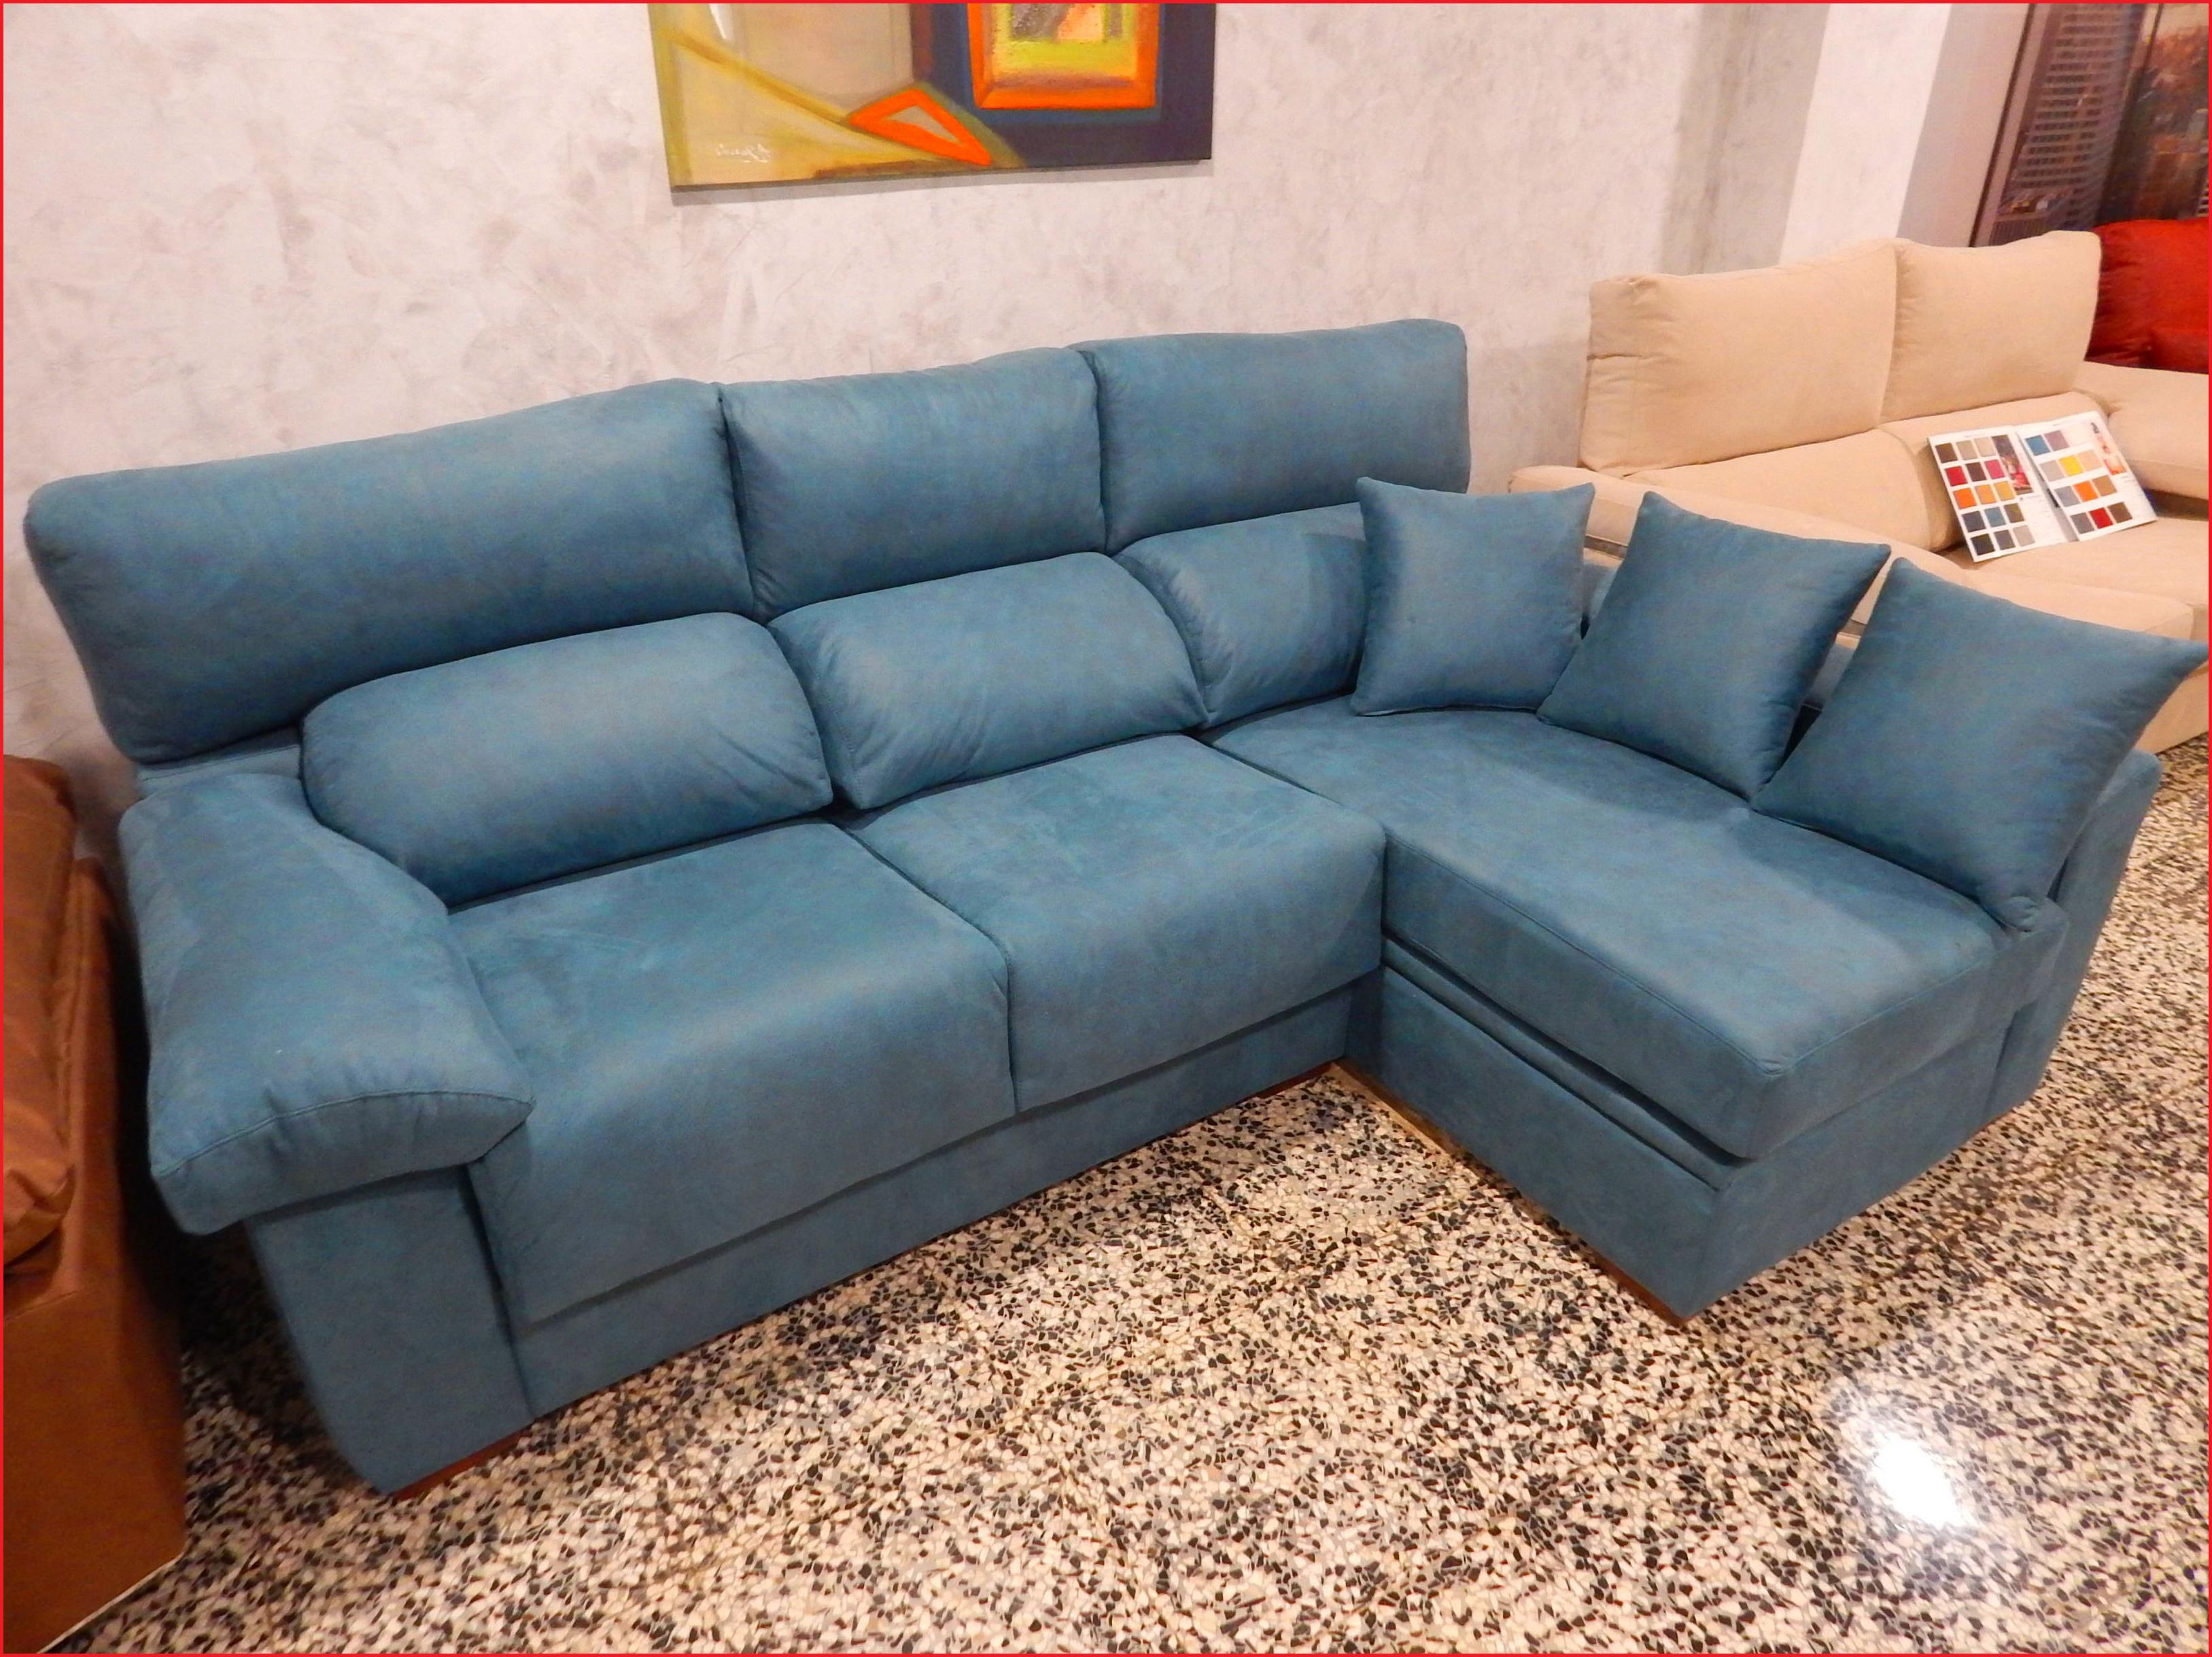 Sofas De Diseño Baratos Q0d4 Muebles Baratos En Zaragoza Foto 4 De sofà S En Zaragoza